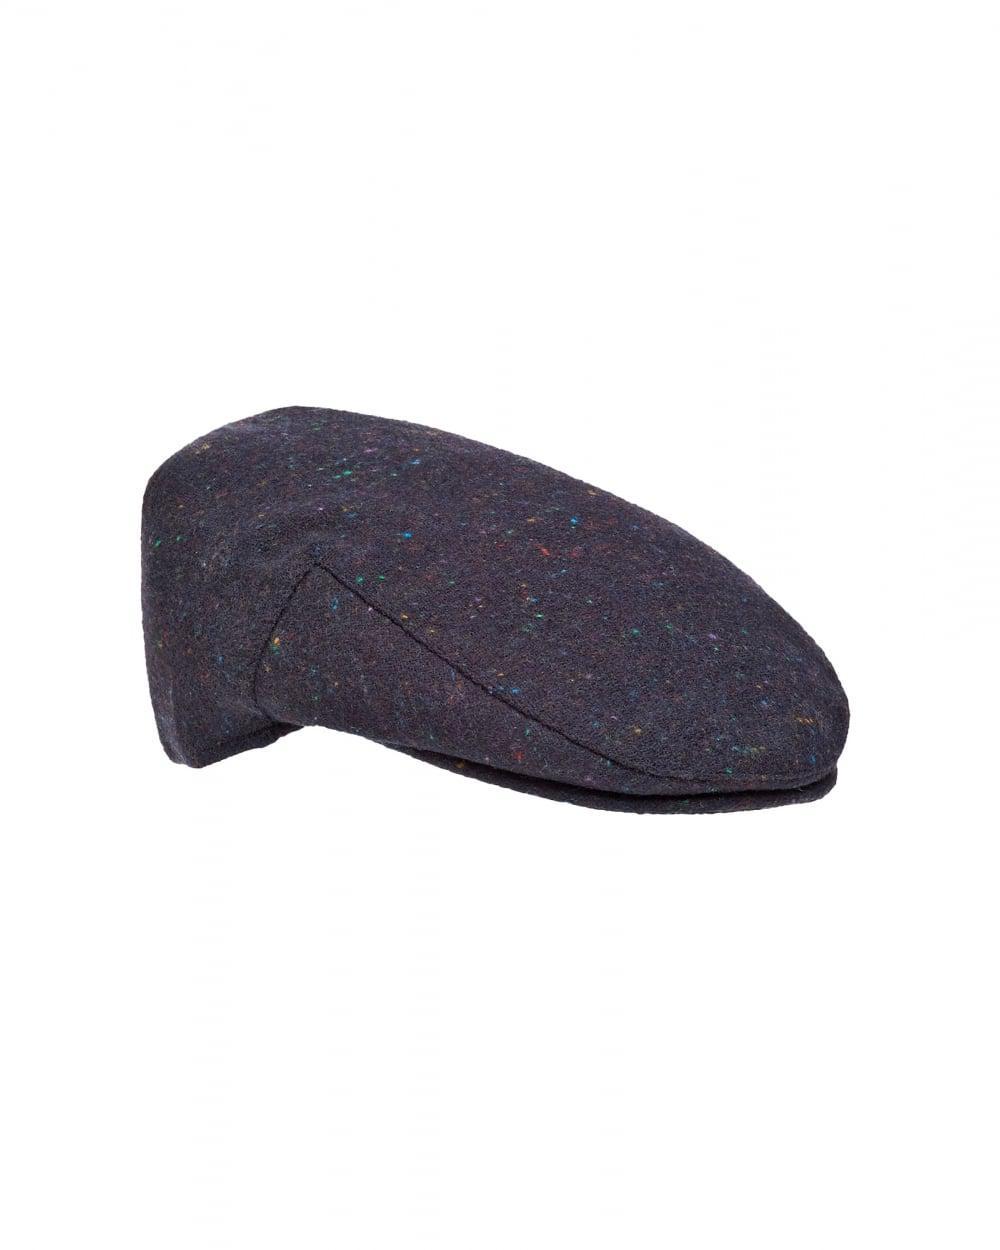 ec00f80fa2b22 Lyst - Barbour Lifestyle Hat